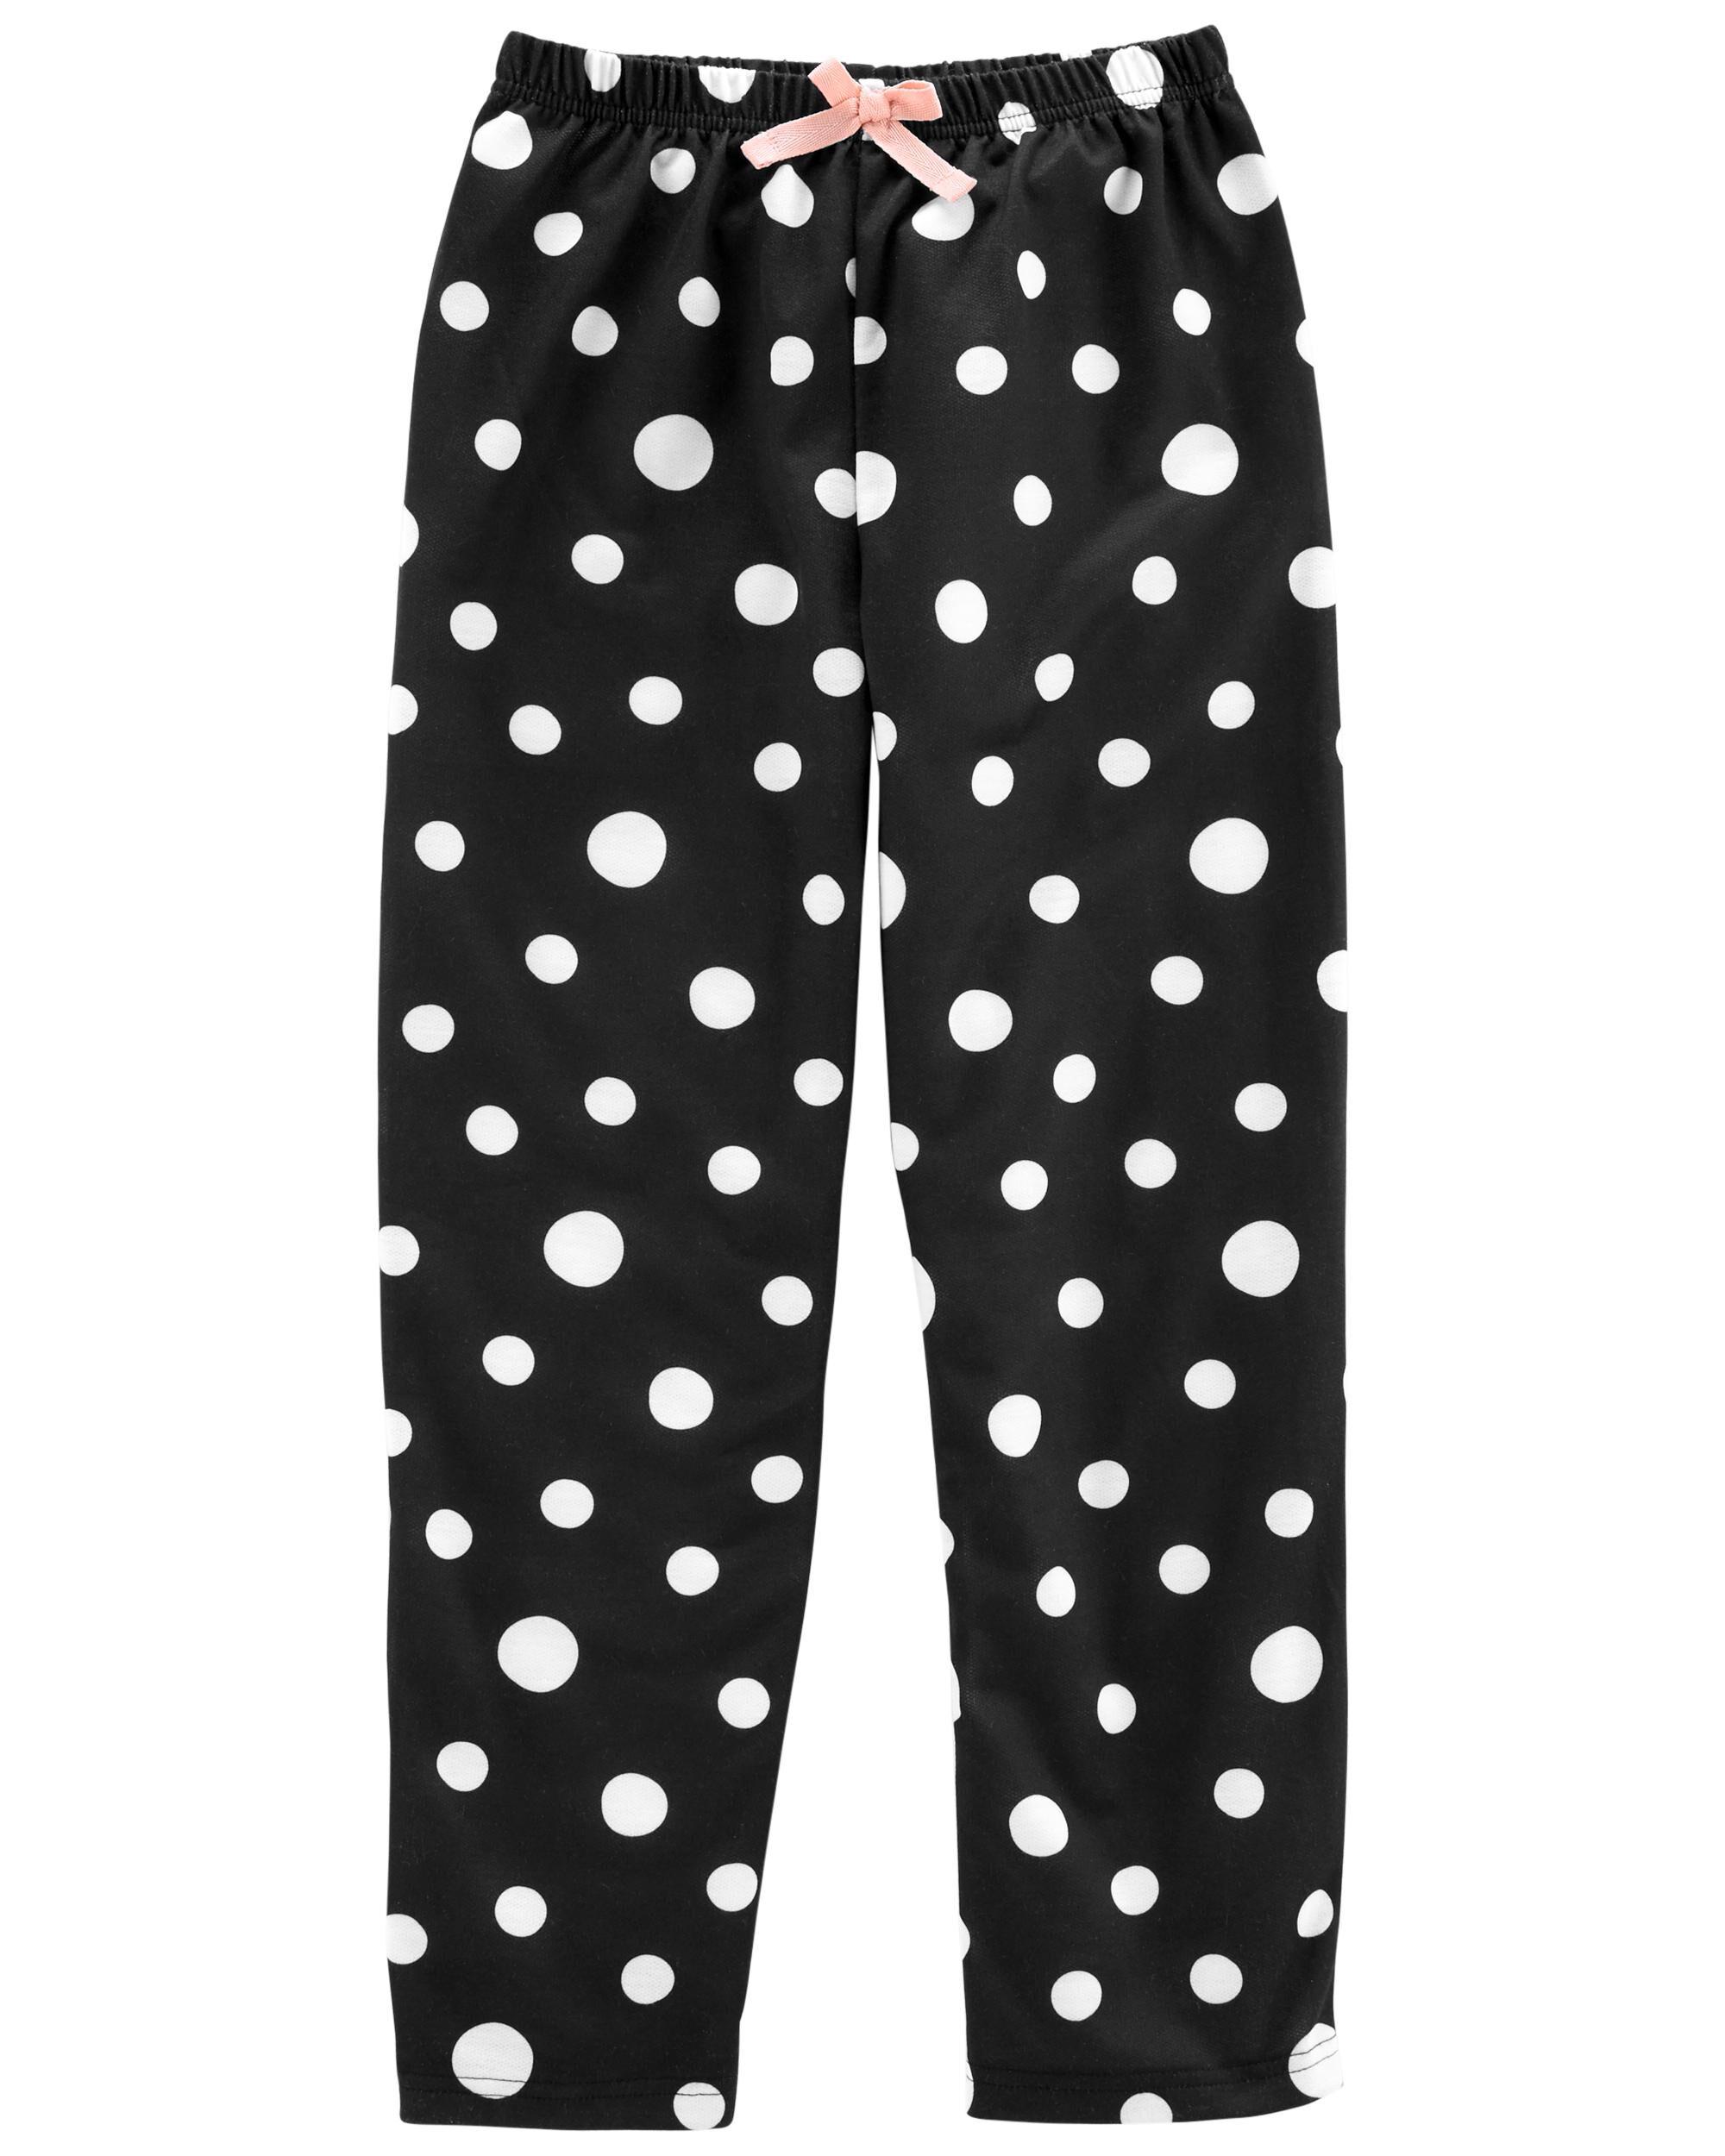 *Clearance*  Polka Dot French Terry Sleep Pants